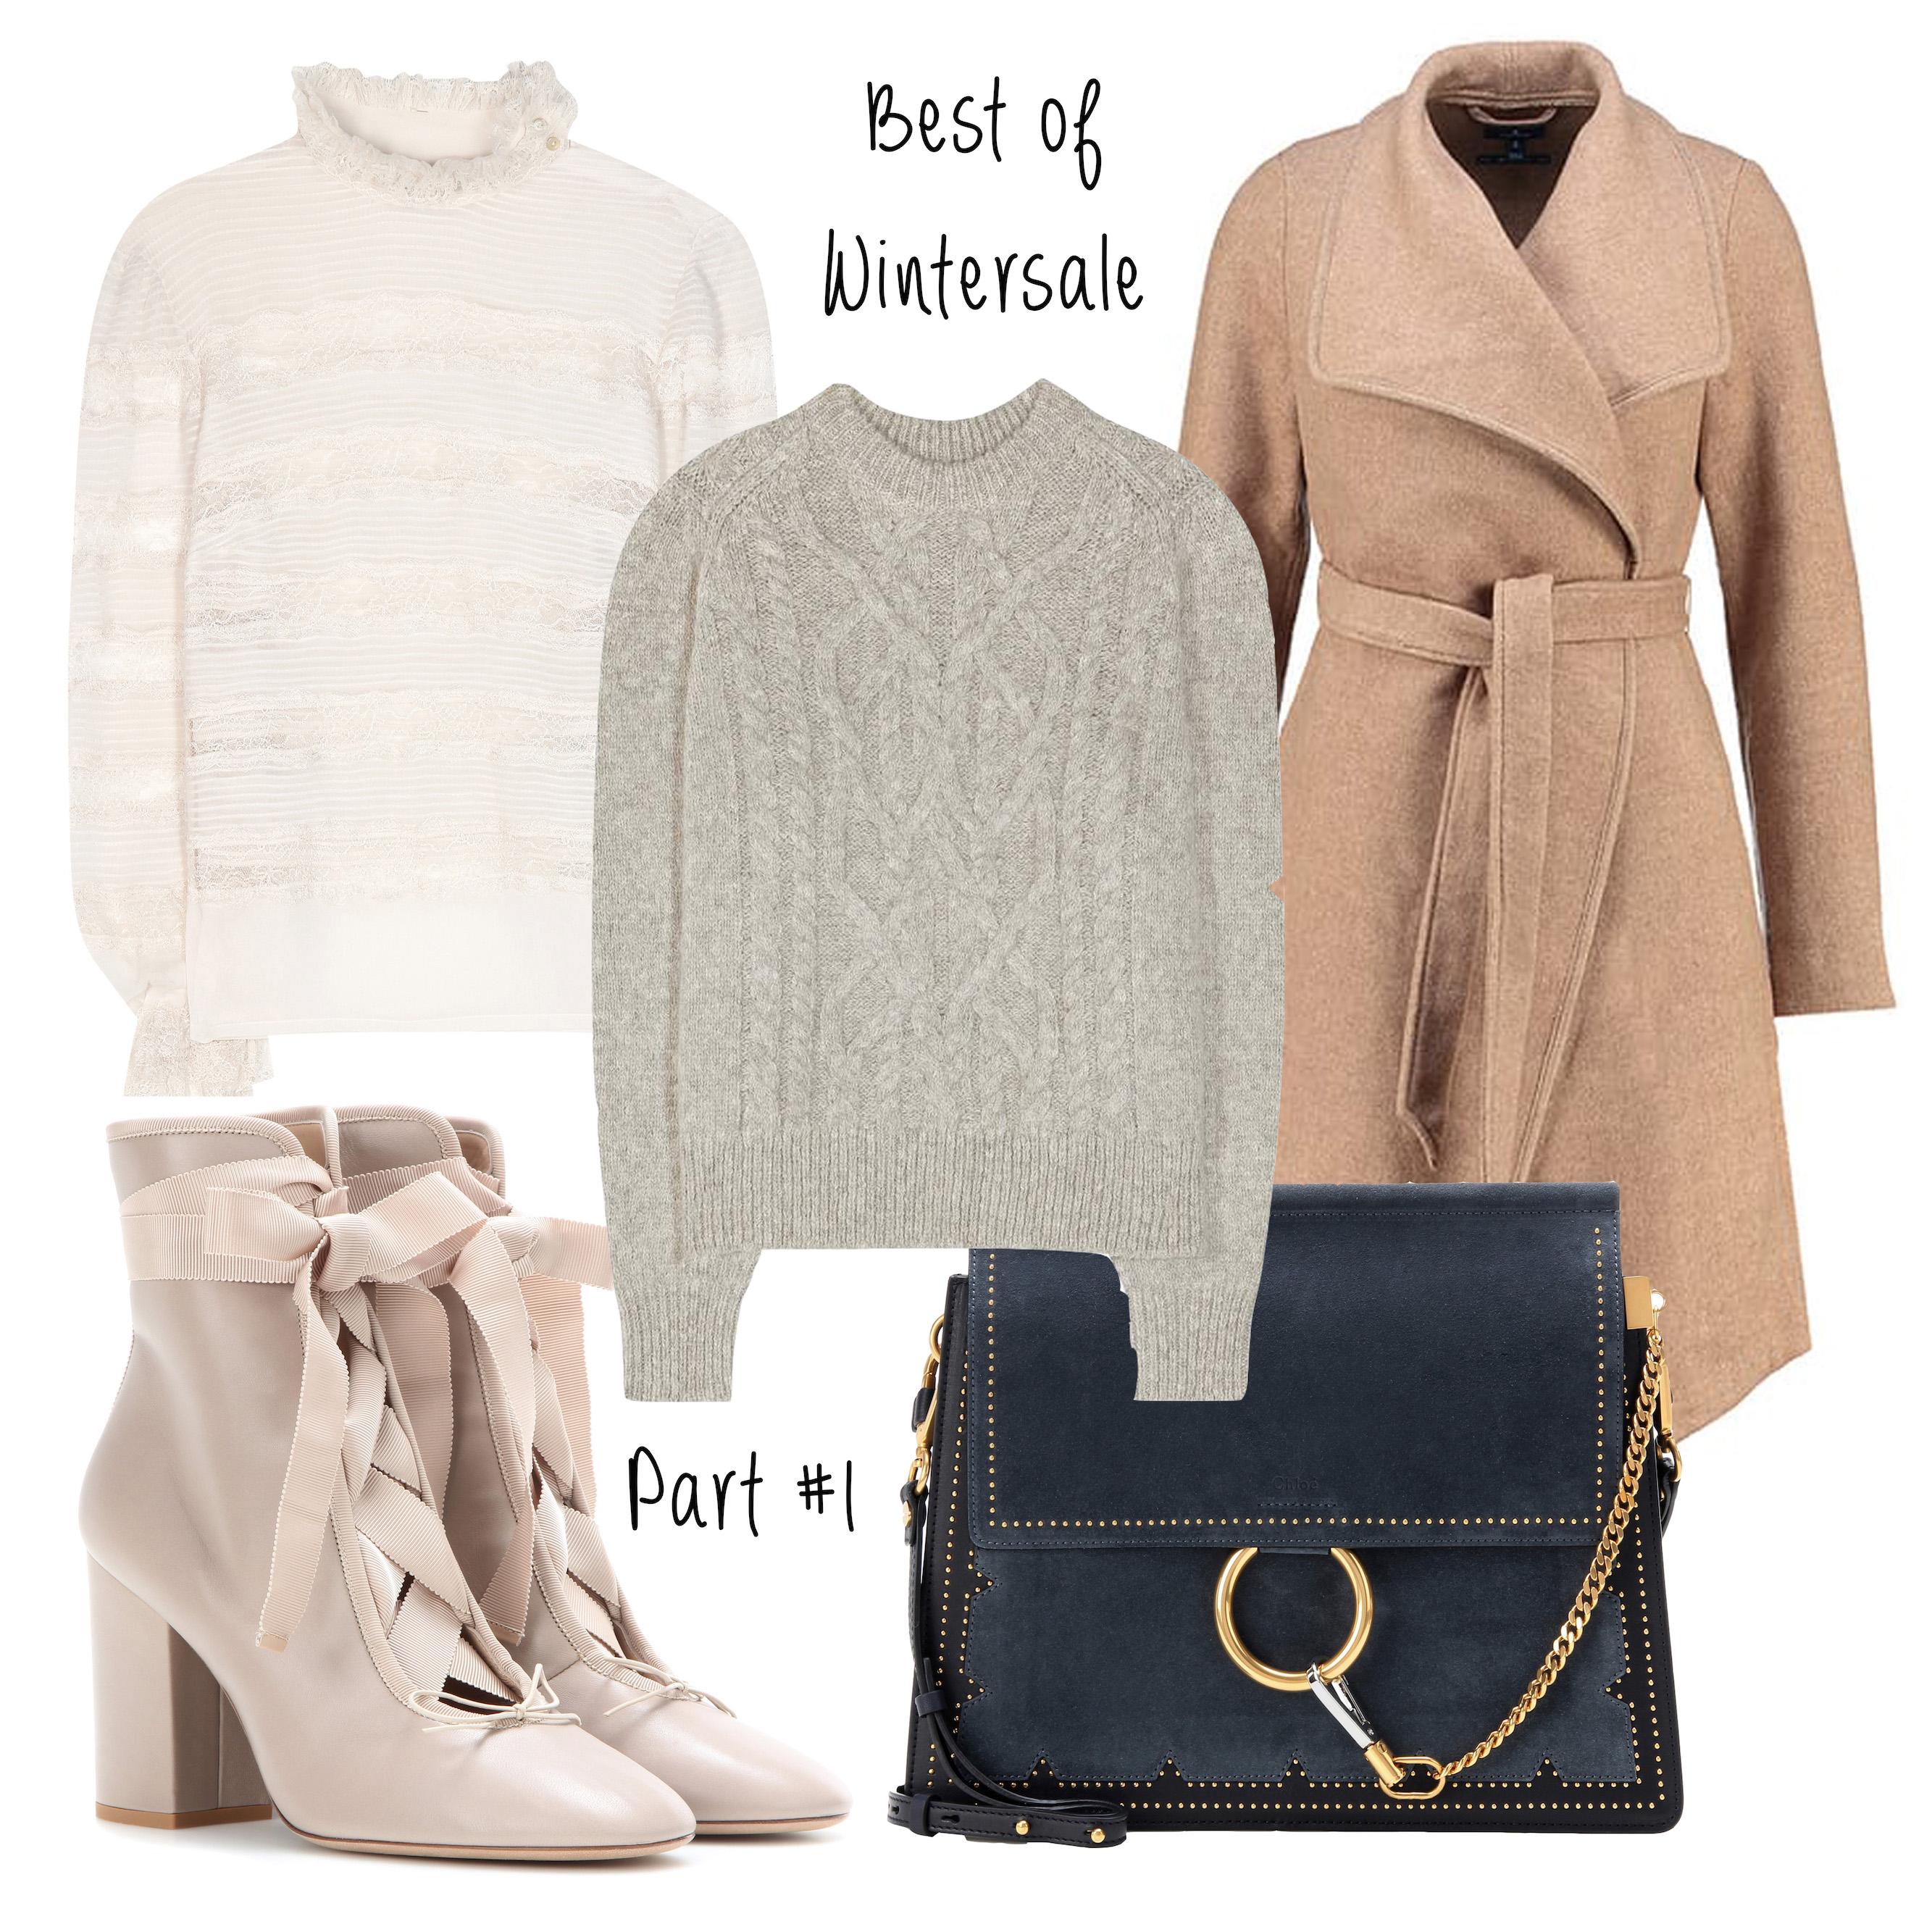 best-of-Winter-Sale-meine-Favoriten-Stylemocca